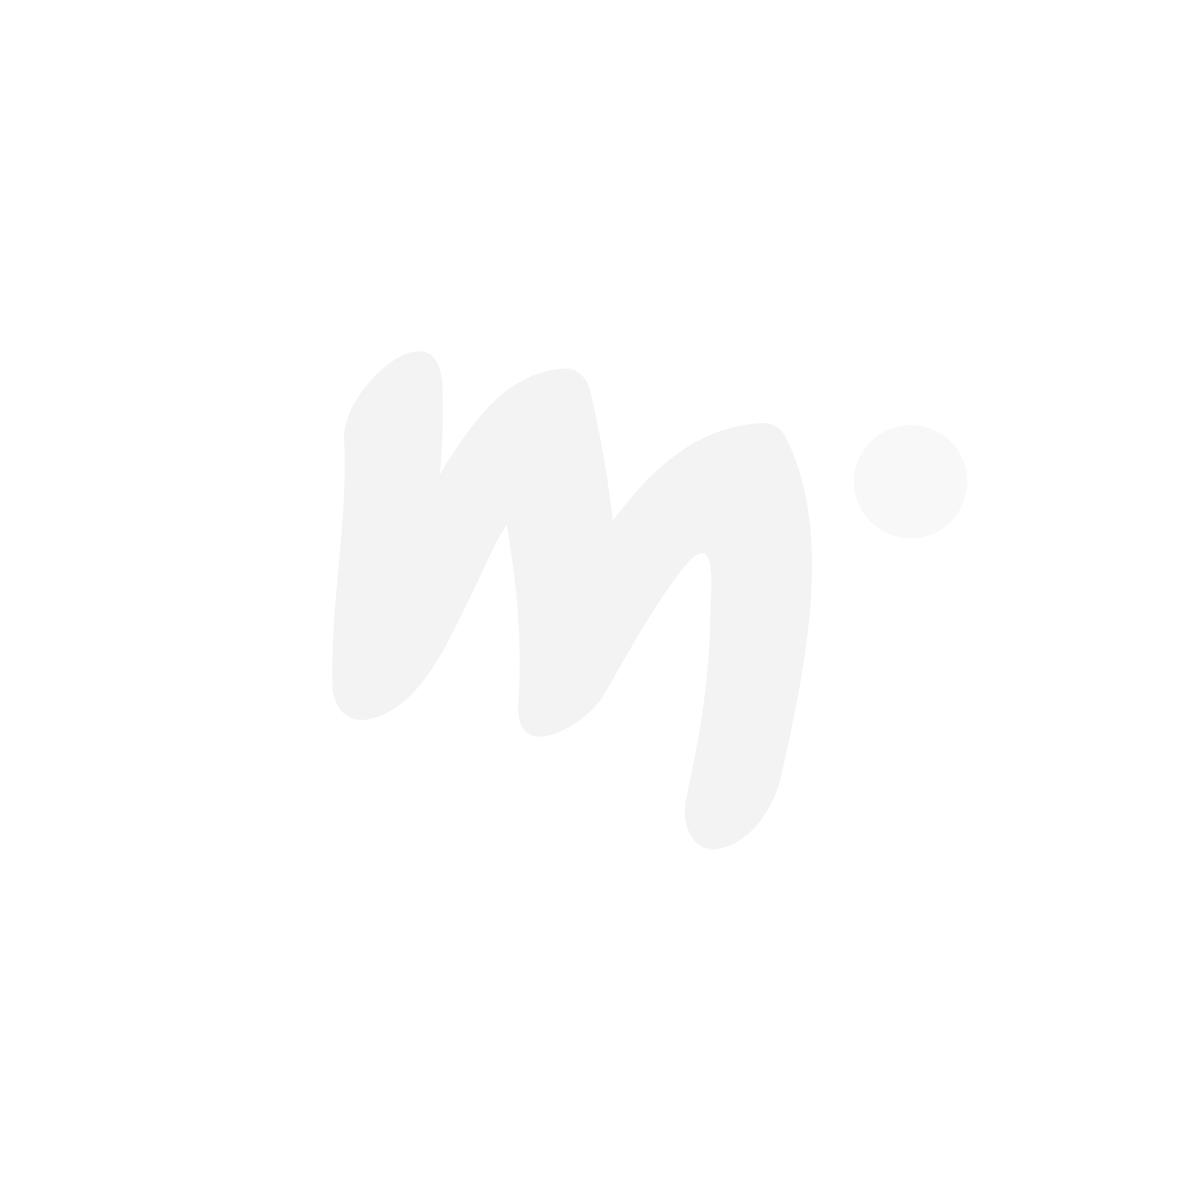 Muumi Kiipeilypuu-pyjama harmaa